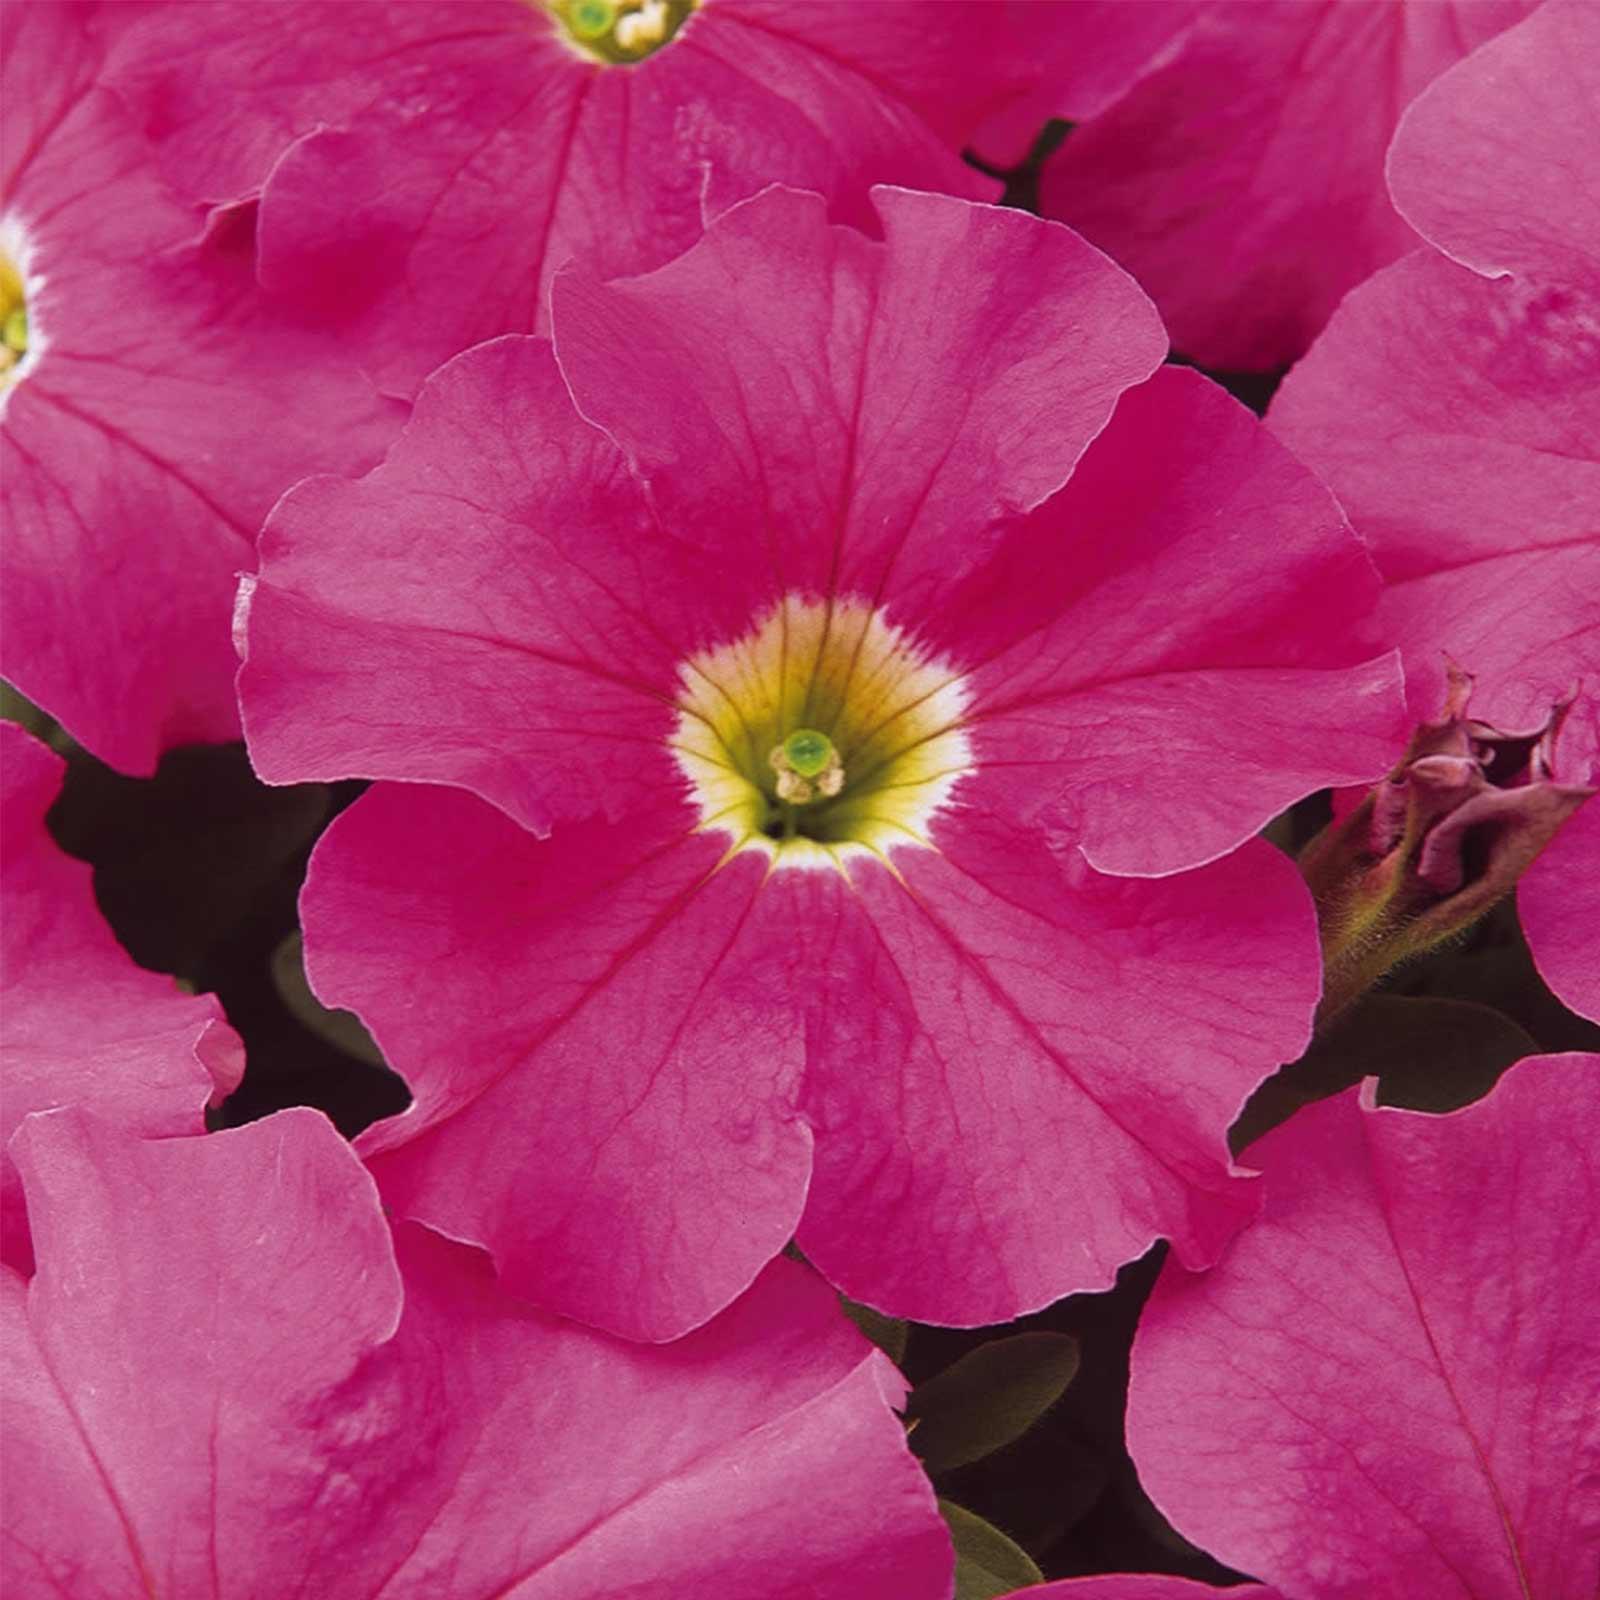 Petunia - Dream Series Flower Garden Seed - 1000 Pelleted Seeds - Midnight Color Flowers - Annual Blooms - Single Grandiflora Petunias